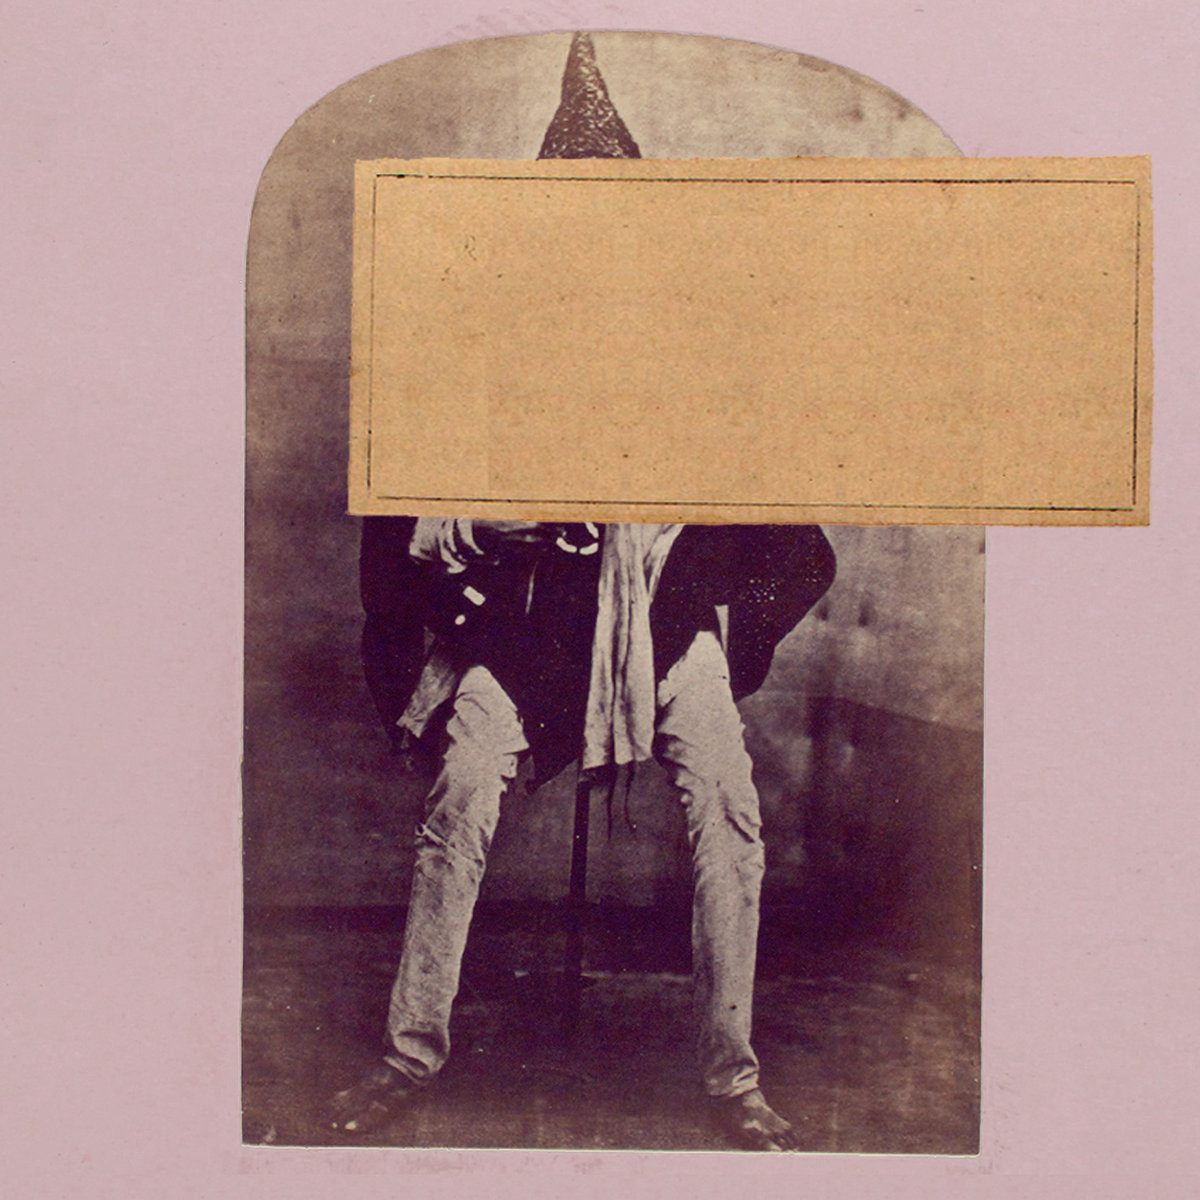 Rob Noyes/Ryan Lee Crosby Cassette